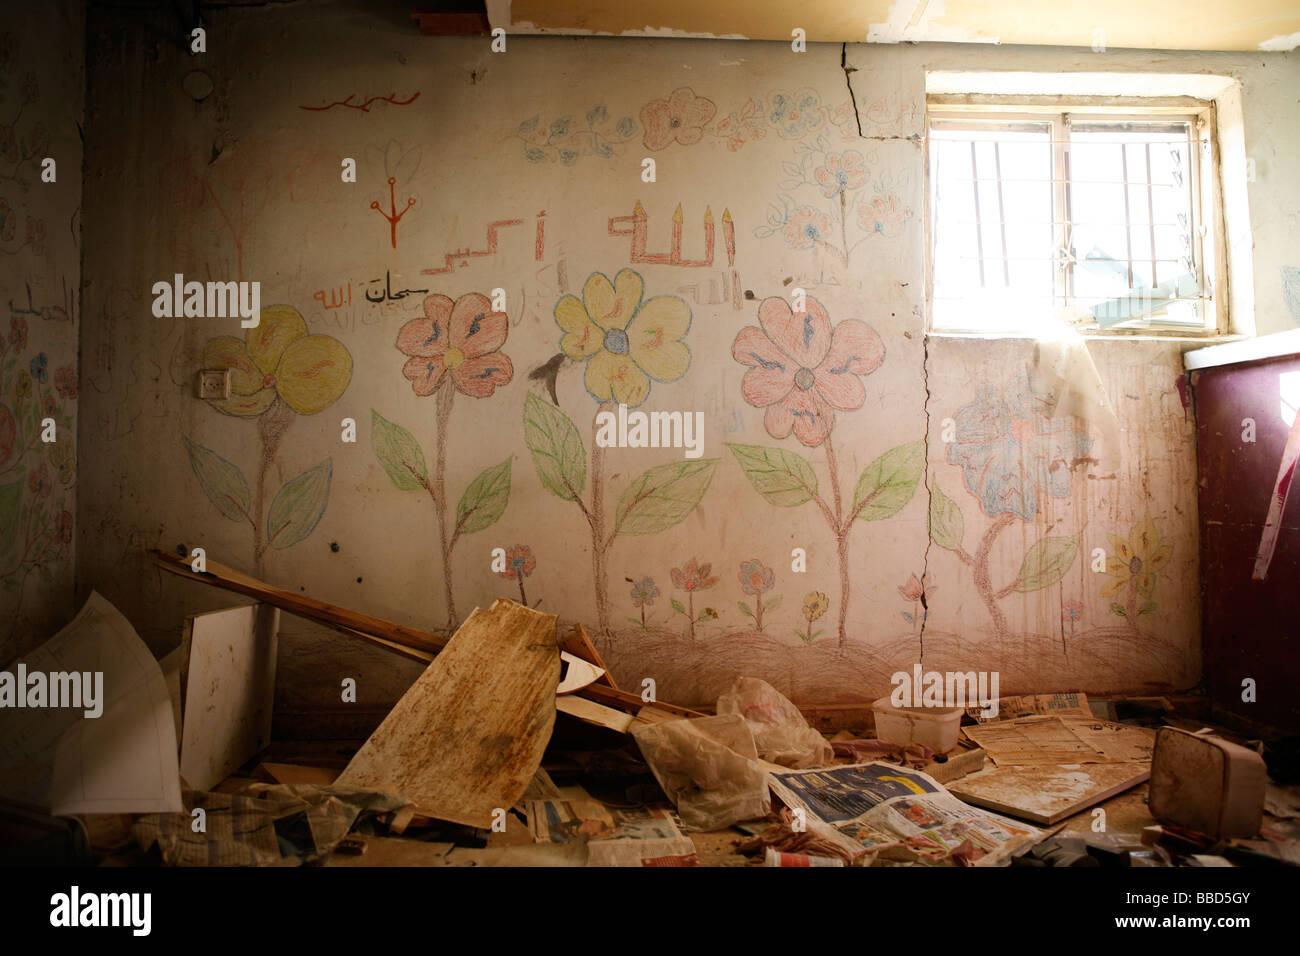 An abandoned house in the Bedouin village of Elokbi. Negev desert, Israel. - Stock Image